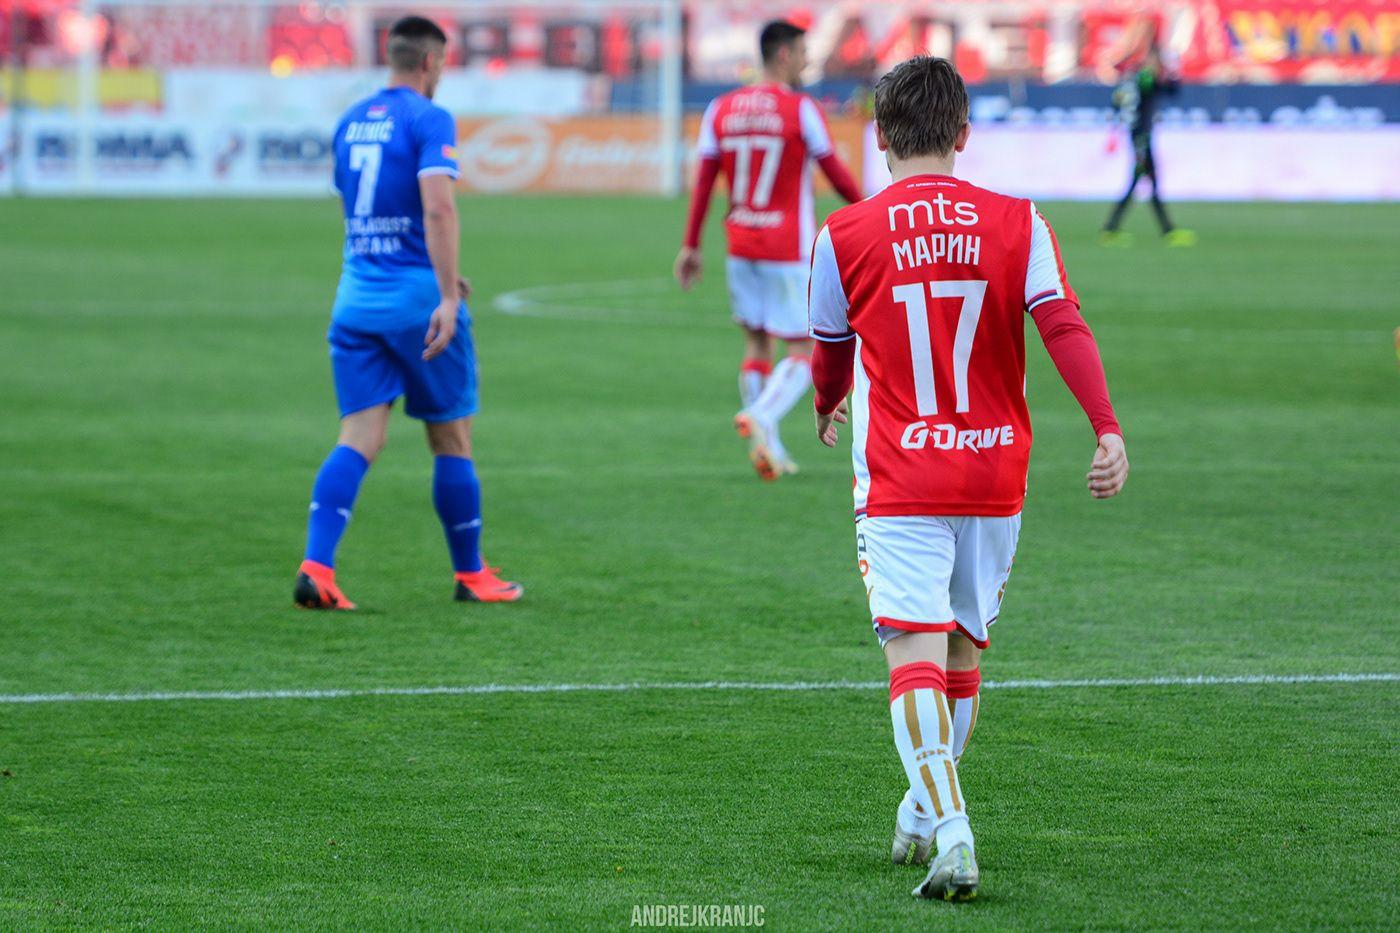 Kup Srbije Crvena zvezda vs Mladost Lučani on Behance